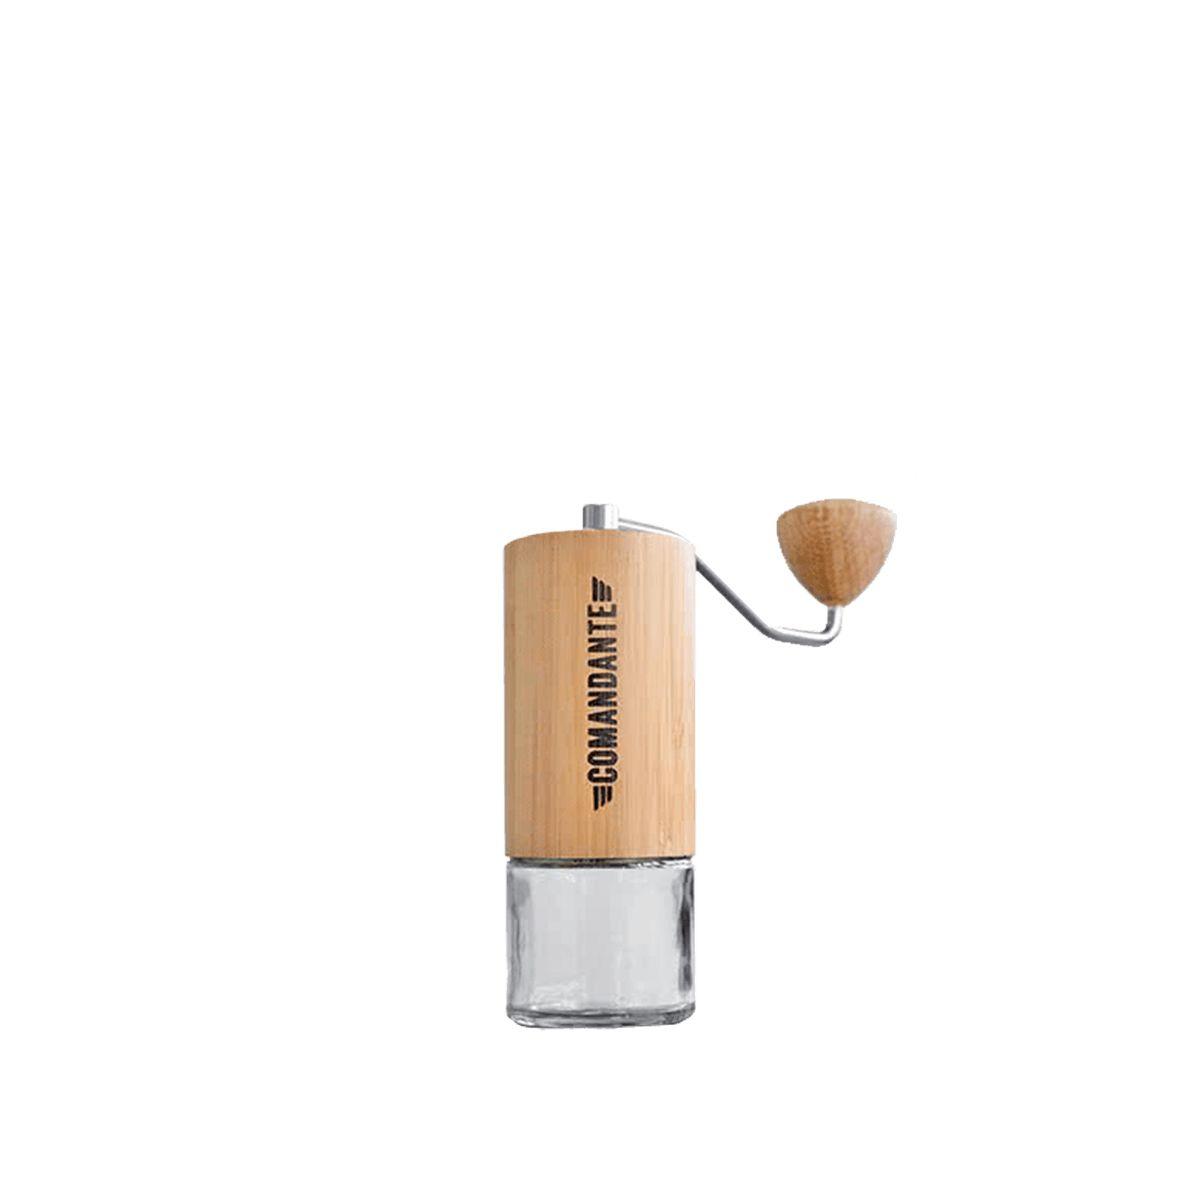 Coffee Grinder Comandante C40 [MK3] Nitro Blade - Bamboo